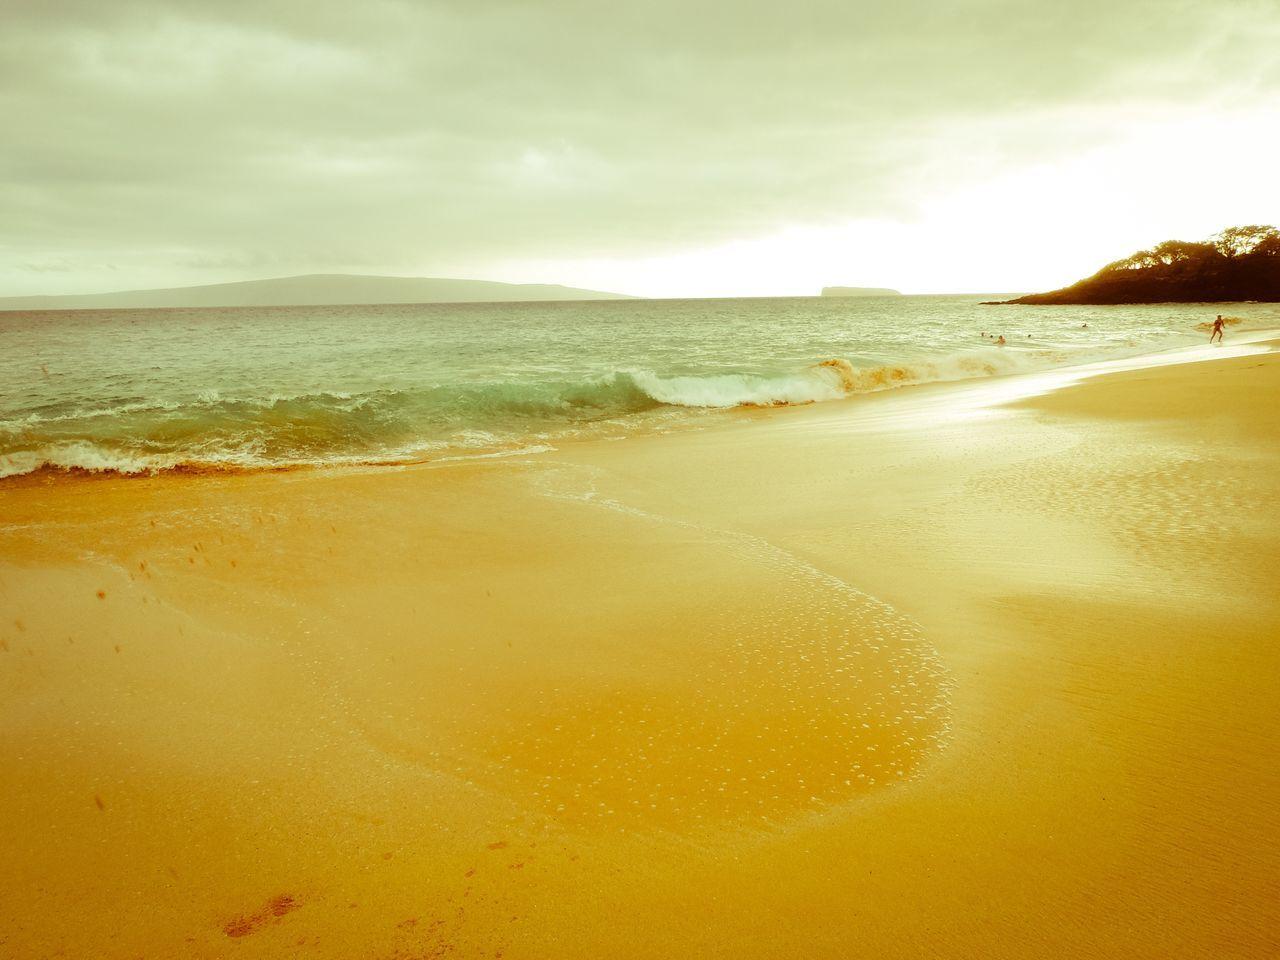 Maui Kihei, Maui Makena Maui Beach Shore Sand Water Beauty In Nature Tranquil Scene Scenics